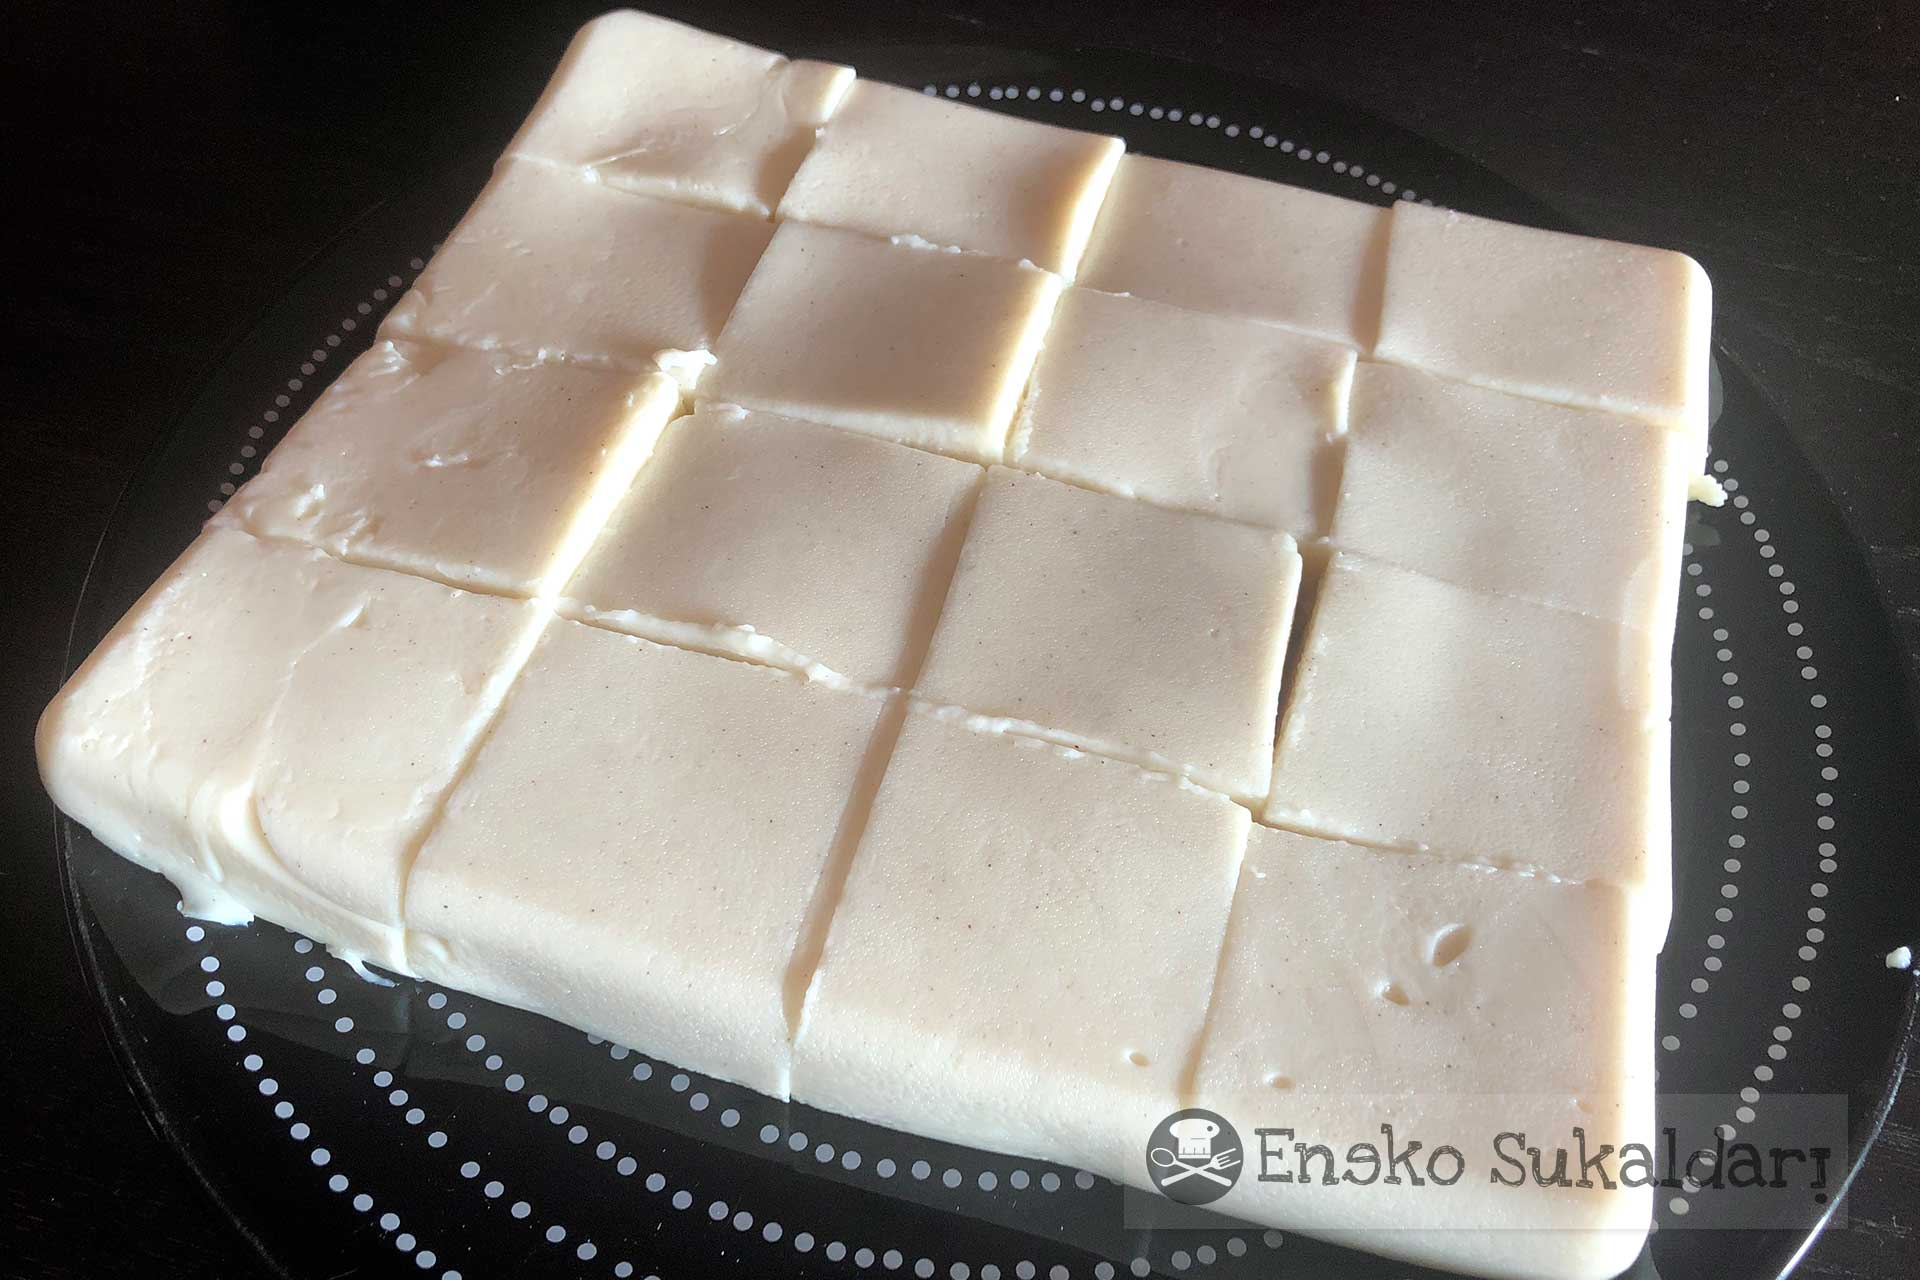 Leche frita o tostadas de crema - receta - Eneko sukaldari